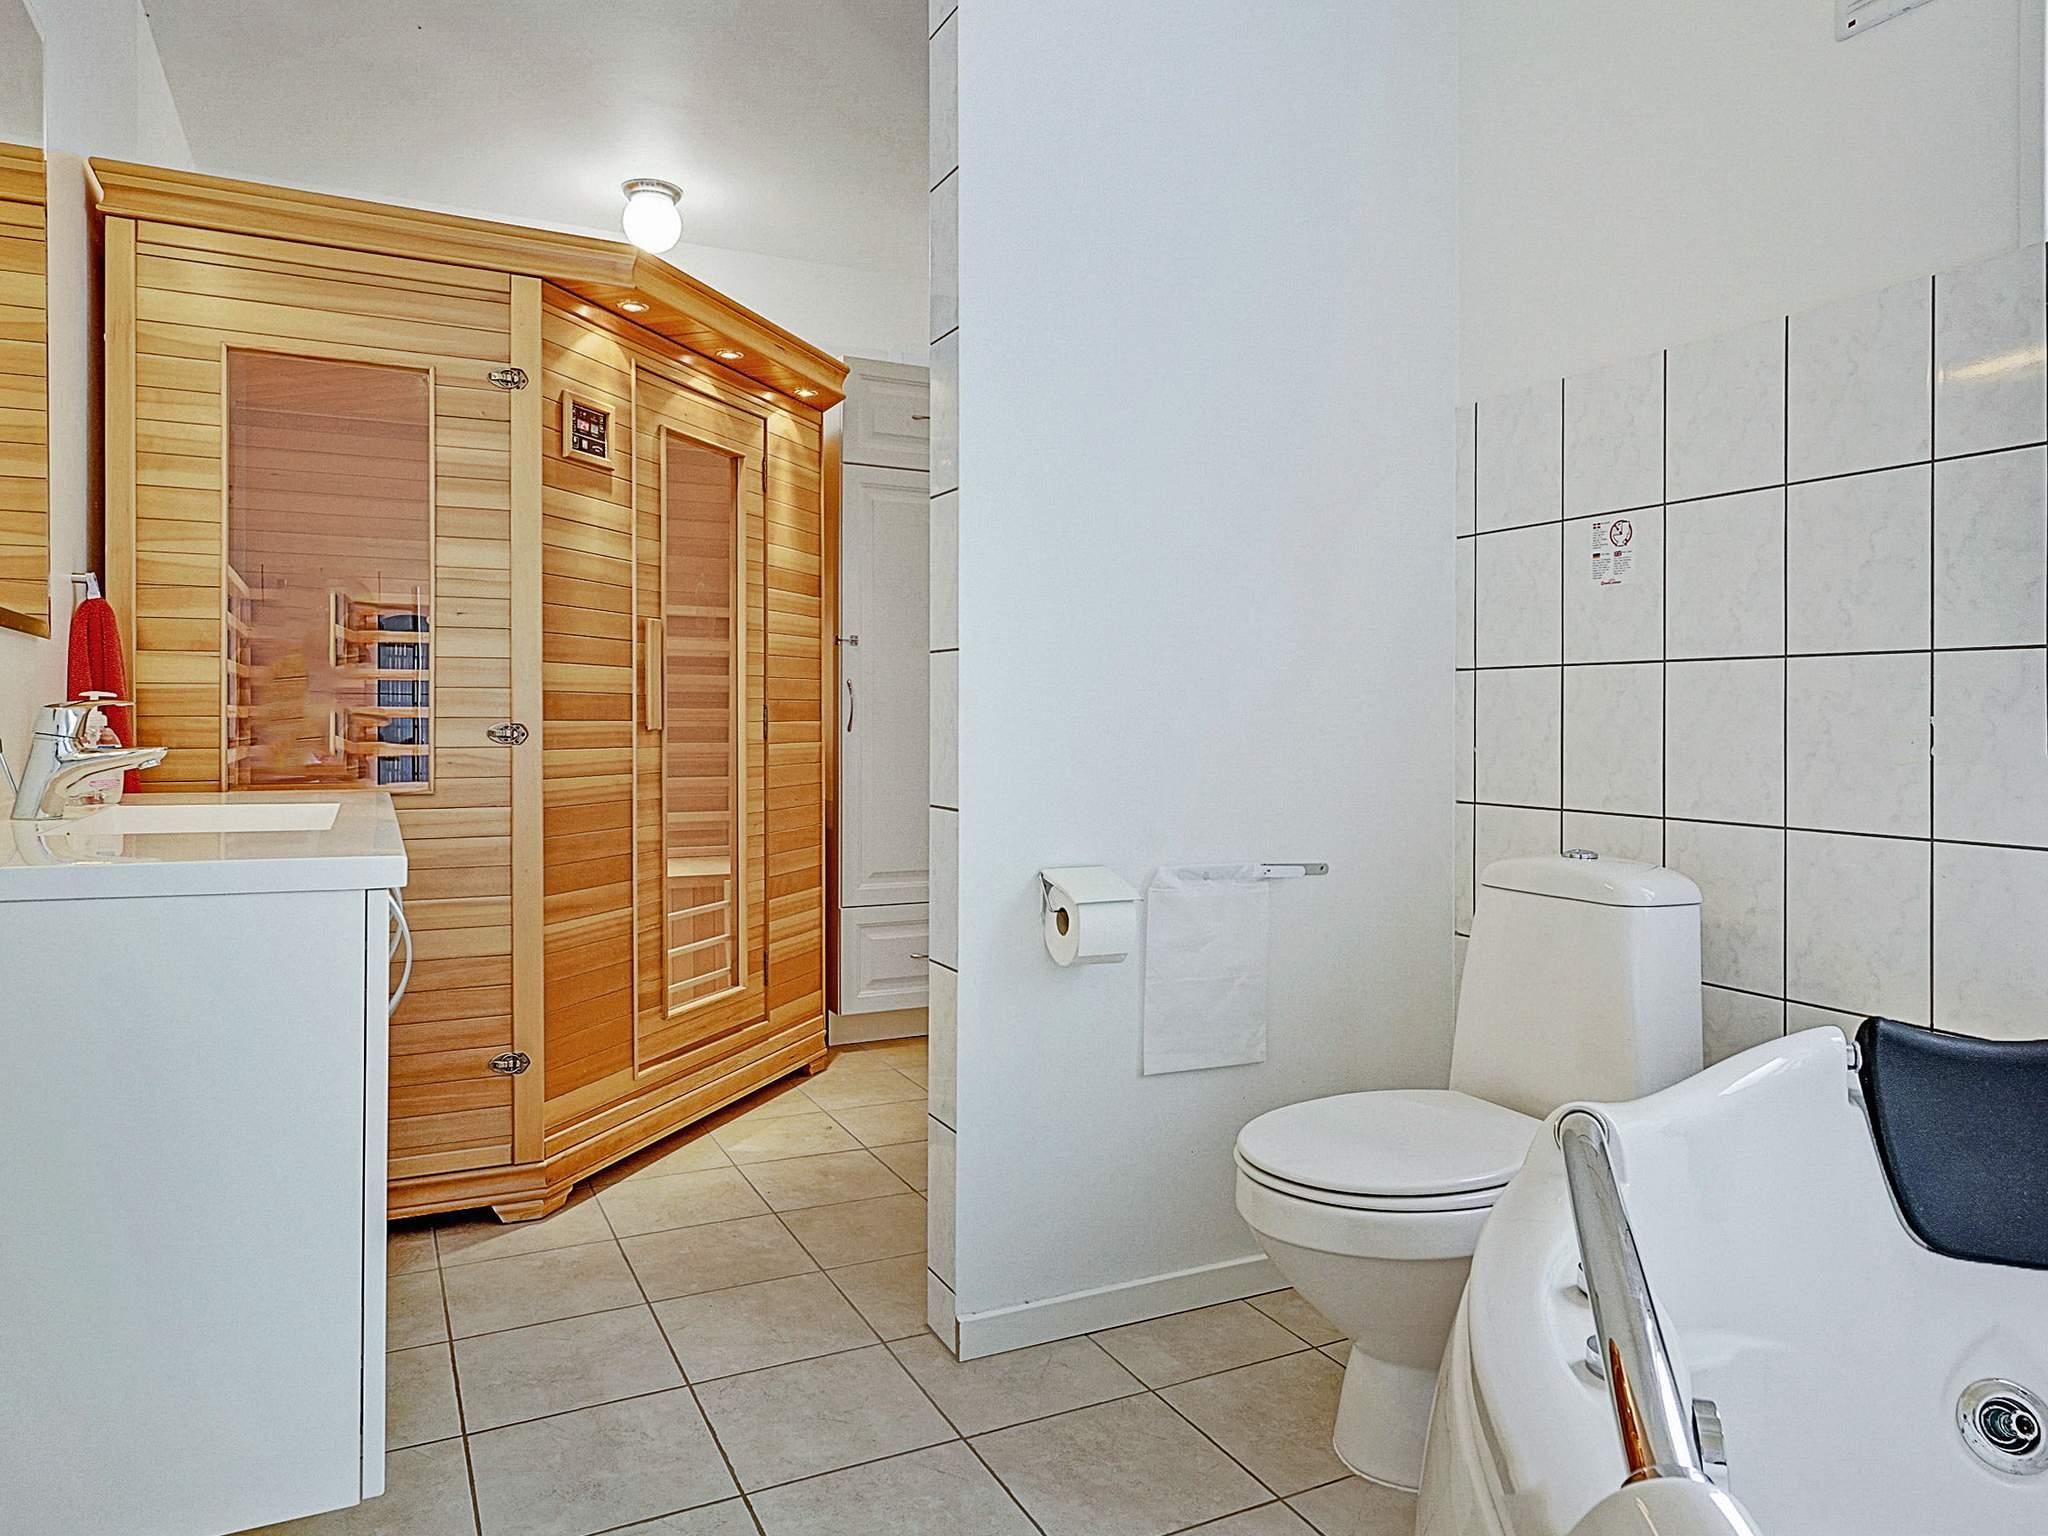 Ferienhaus Bukkemose (500812), Humble, , Langeland, Dänemark, Bild 18